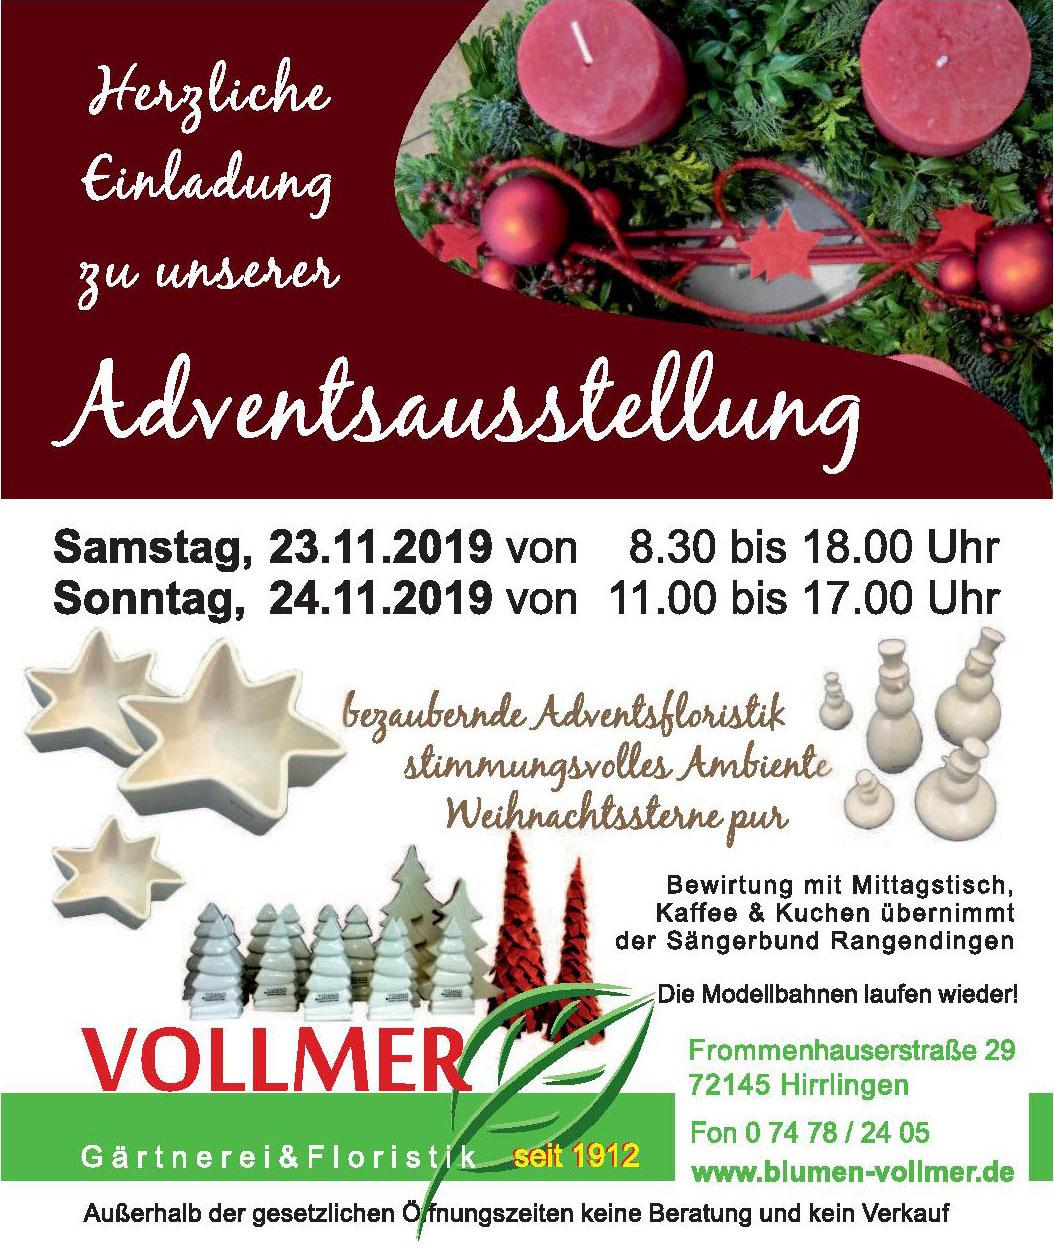 Vollmer Gärtnerei & Floristik